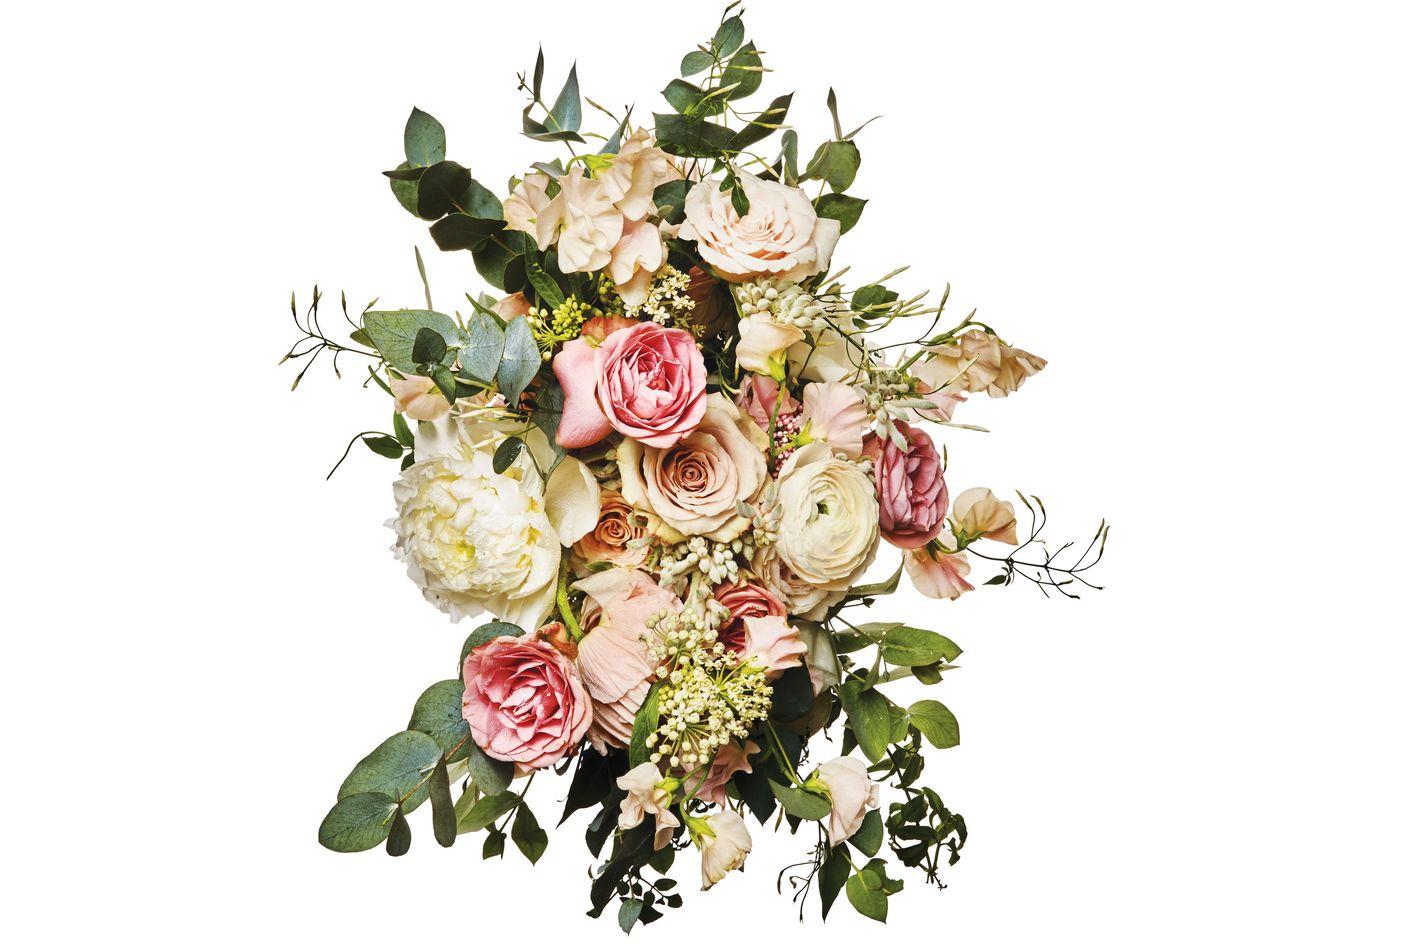 Garden rose, ranunculus, sweet pea, lisianthus, jasmine, peony, and eucalyptus